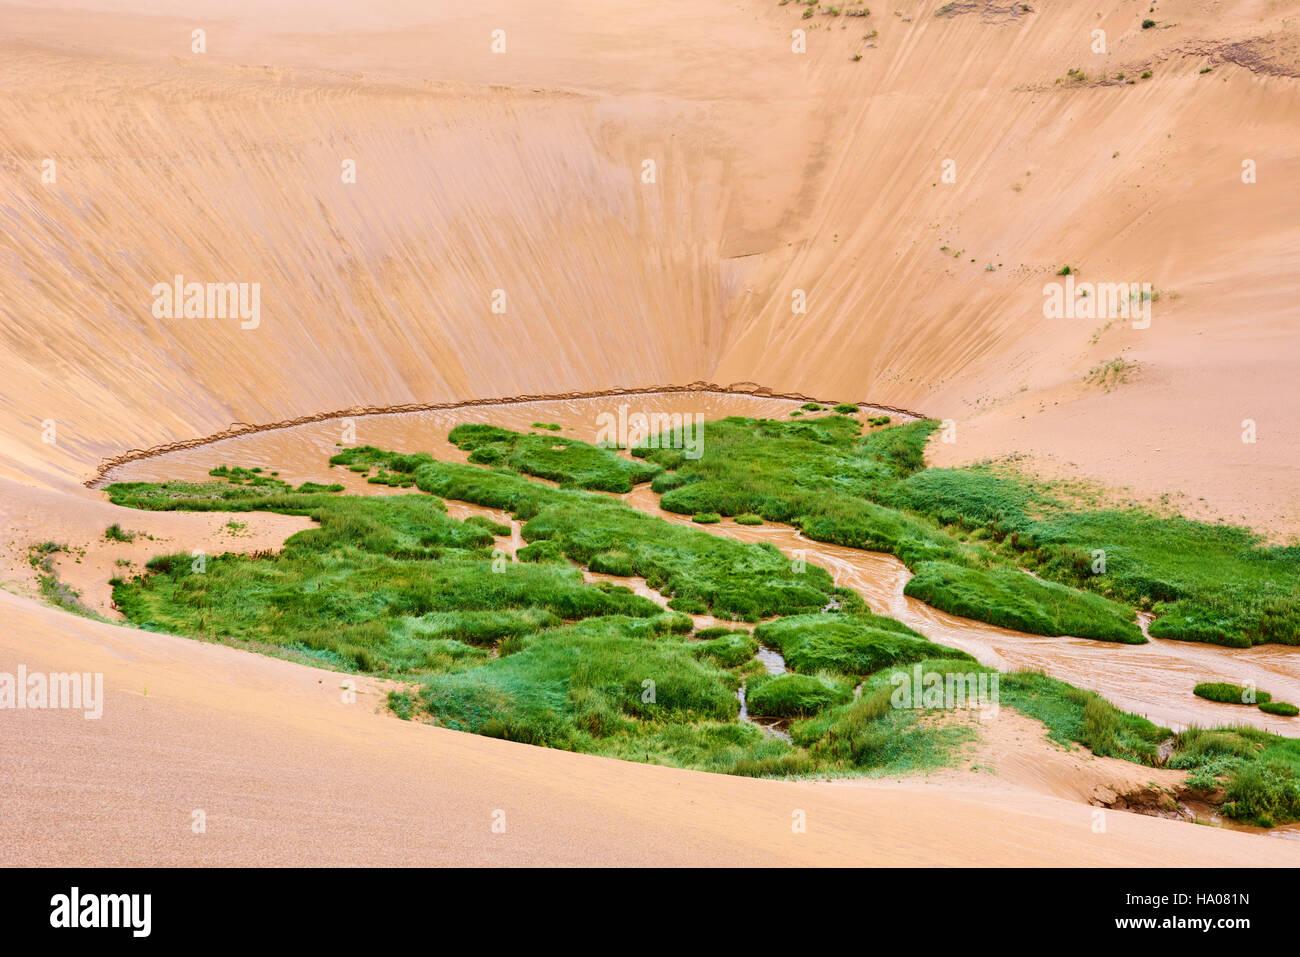 Mongolia, Zavkhan province, deserted landscape of sand dunes in the steppe Stock Photo